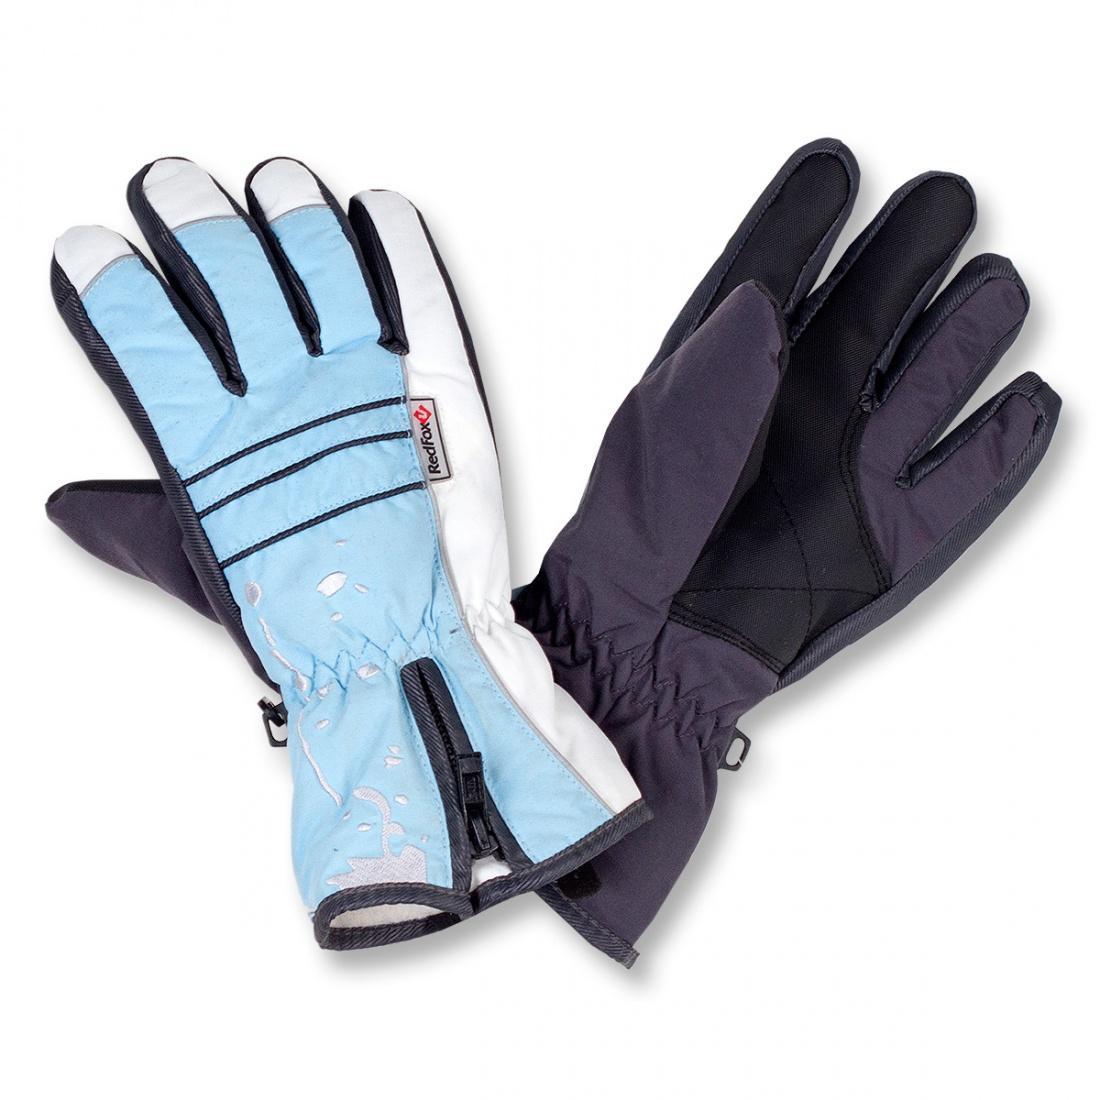 Перчатки SprayПерчатки<br><br> Удобные и теплые перчатки для детей от 6 до 12 лет.<br><br> <br><br><br><br> Материал – Nylon, DWR.<br><br> <br><br><br> Подкладка – Vario Dry.<br><br><br><br>...<br><br>Цвет: Небесно-голубой<br>Размер: XL